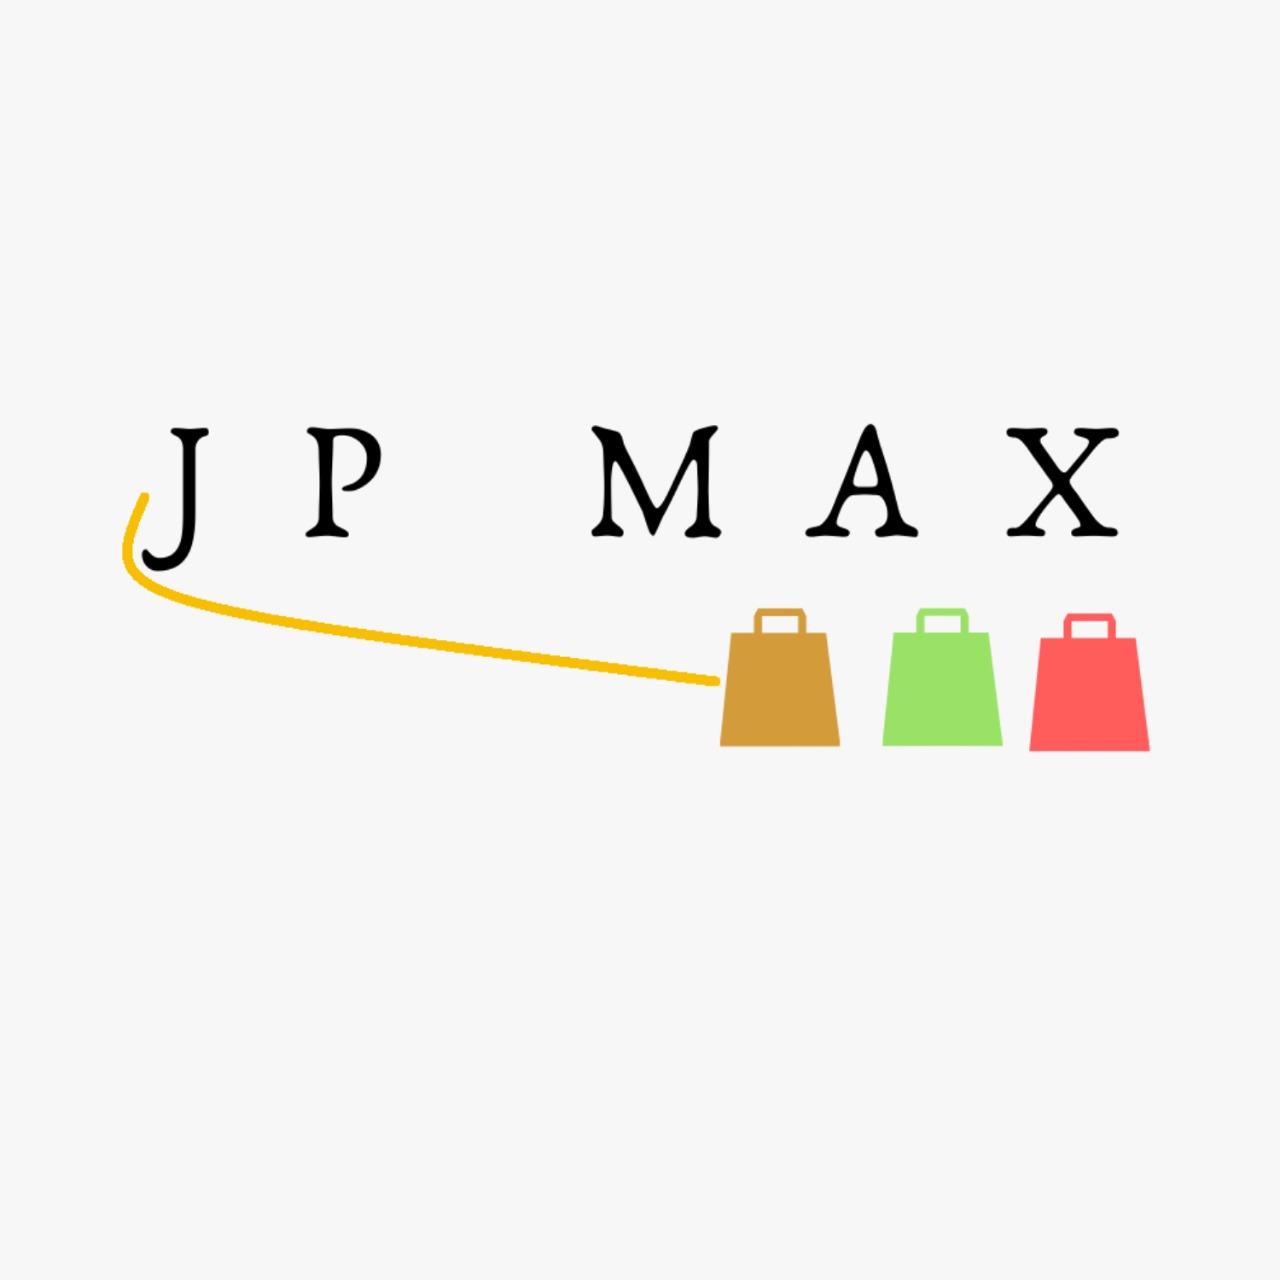 JP Import